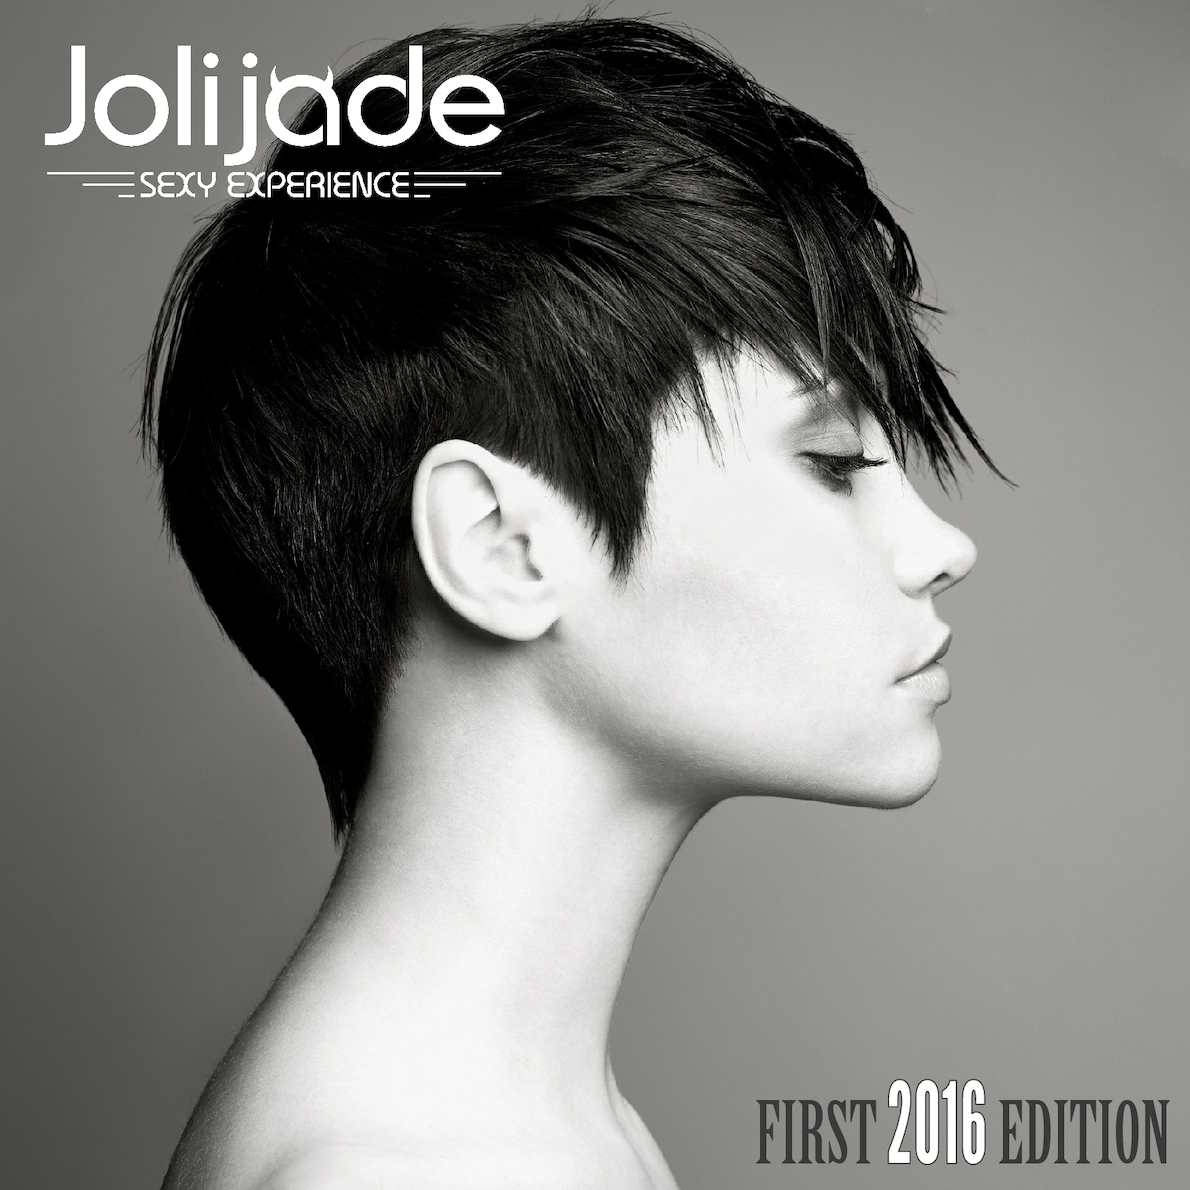 JOLIJADE FIRST EDITION 2016